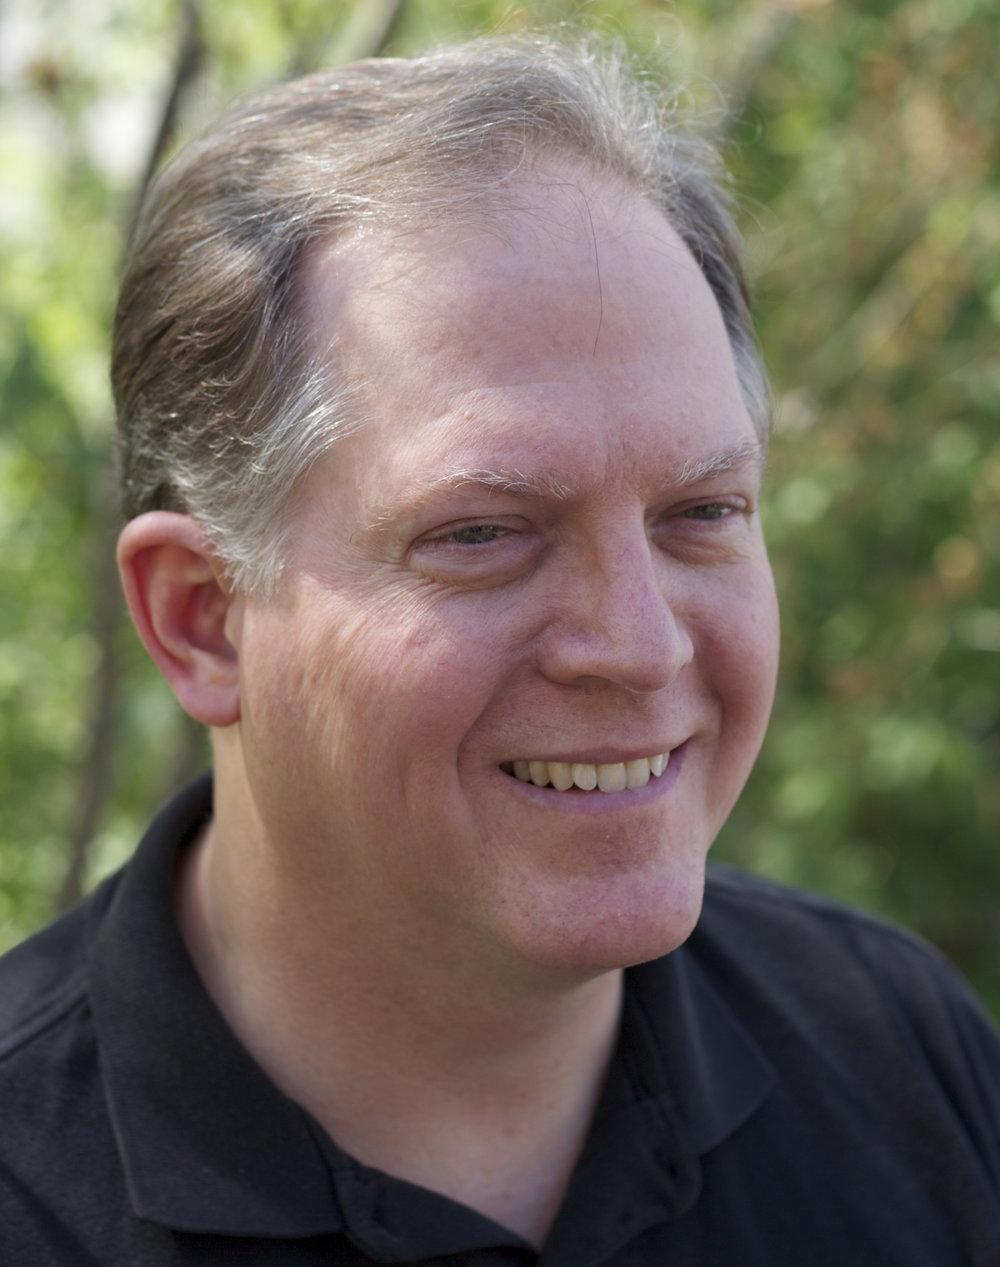 Jeff Lisenby